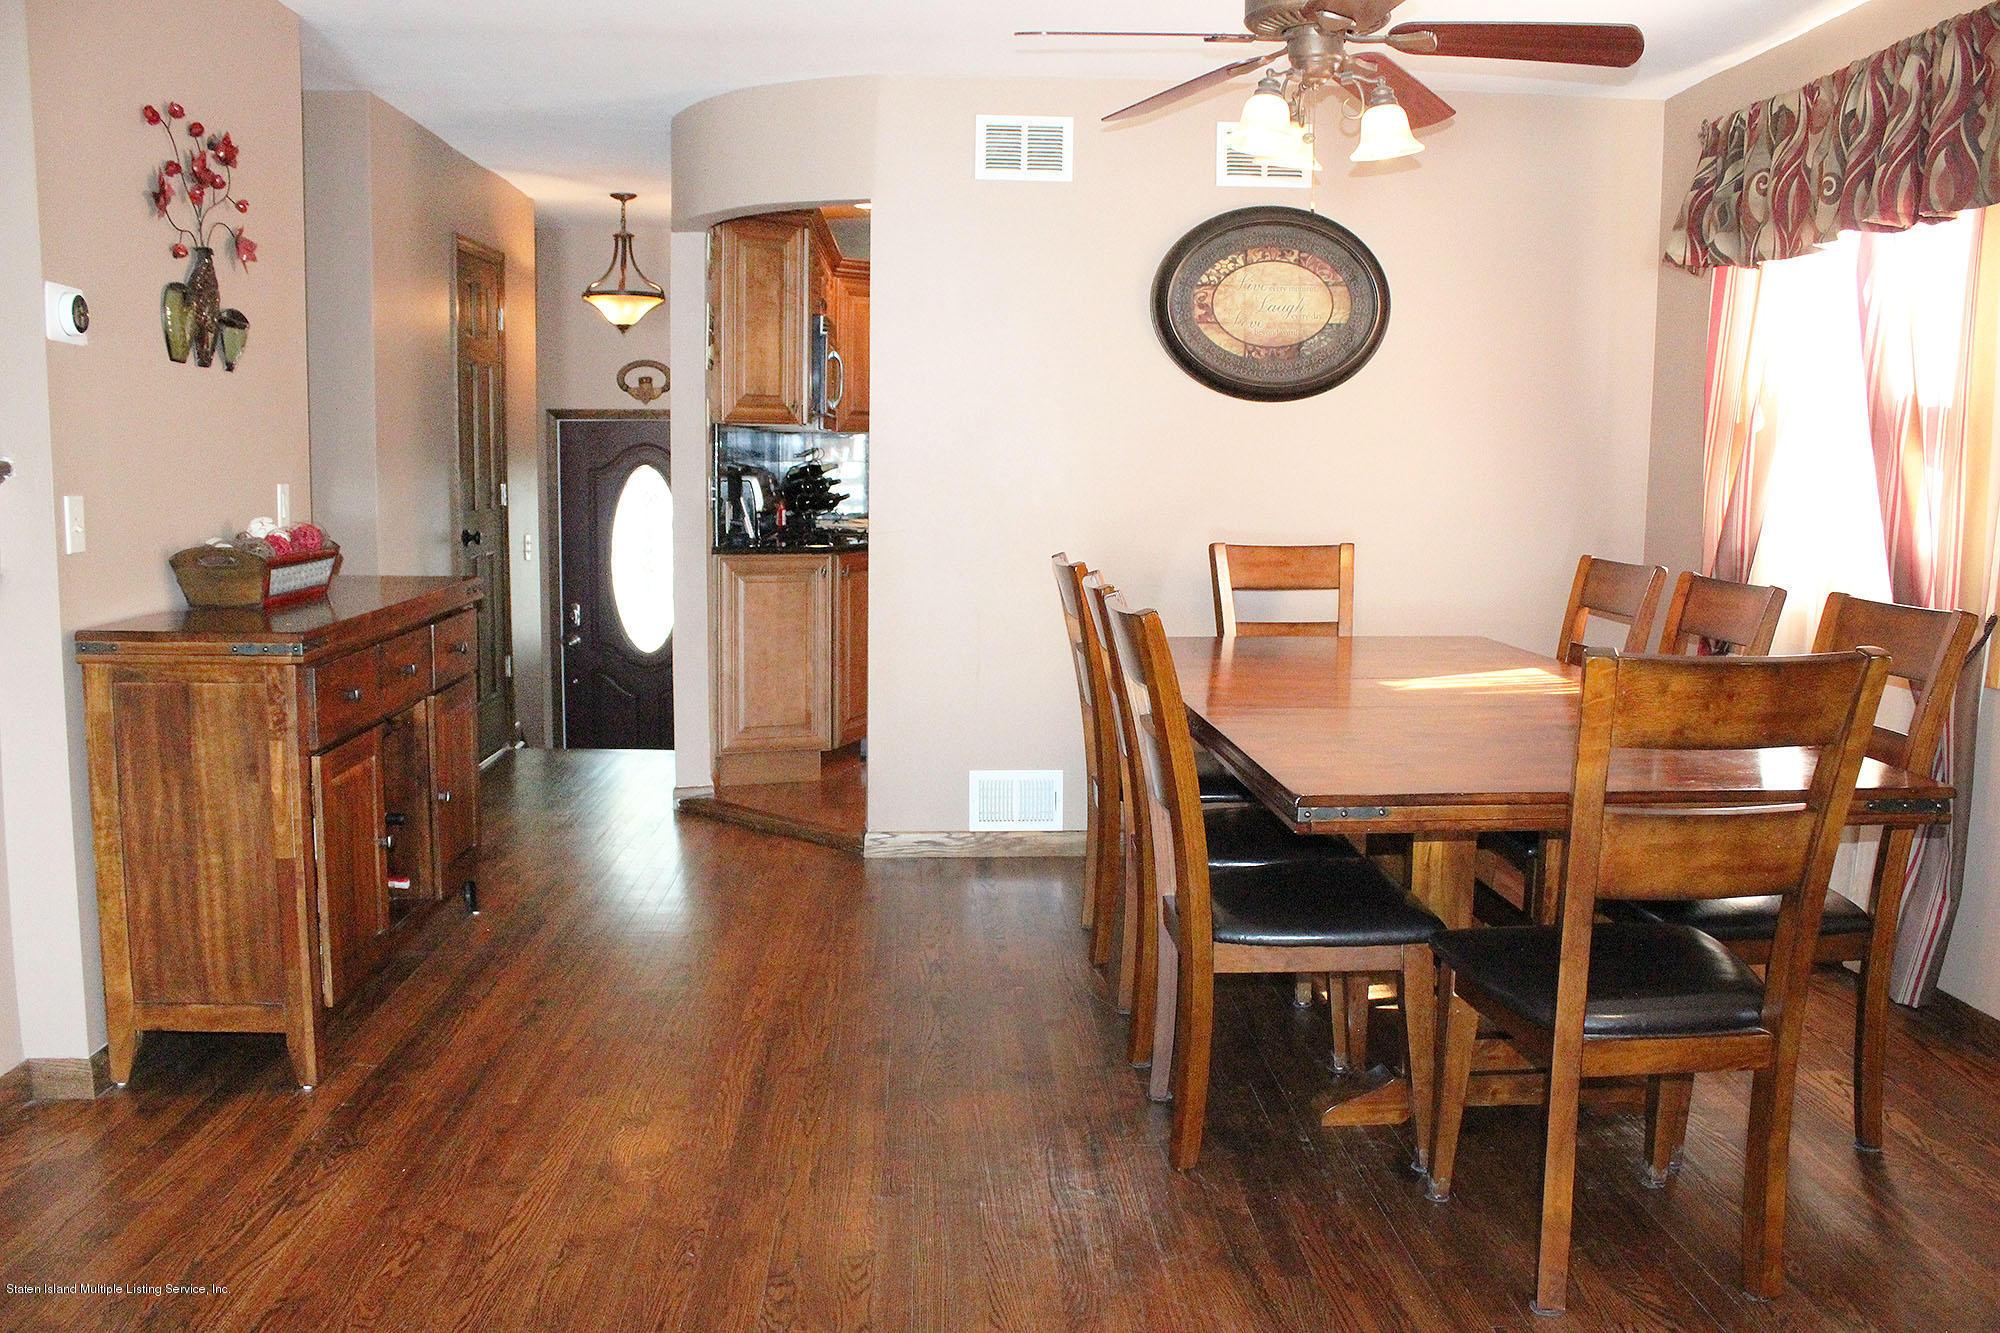 Single Family - Semi-Attached 97 Amber Street  Staten Island, NY 10306, MLS-1130203-4